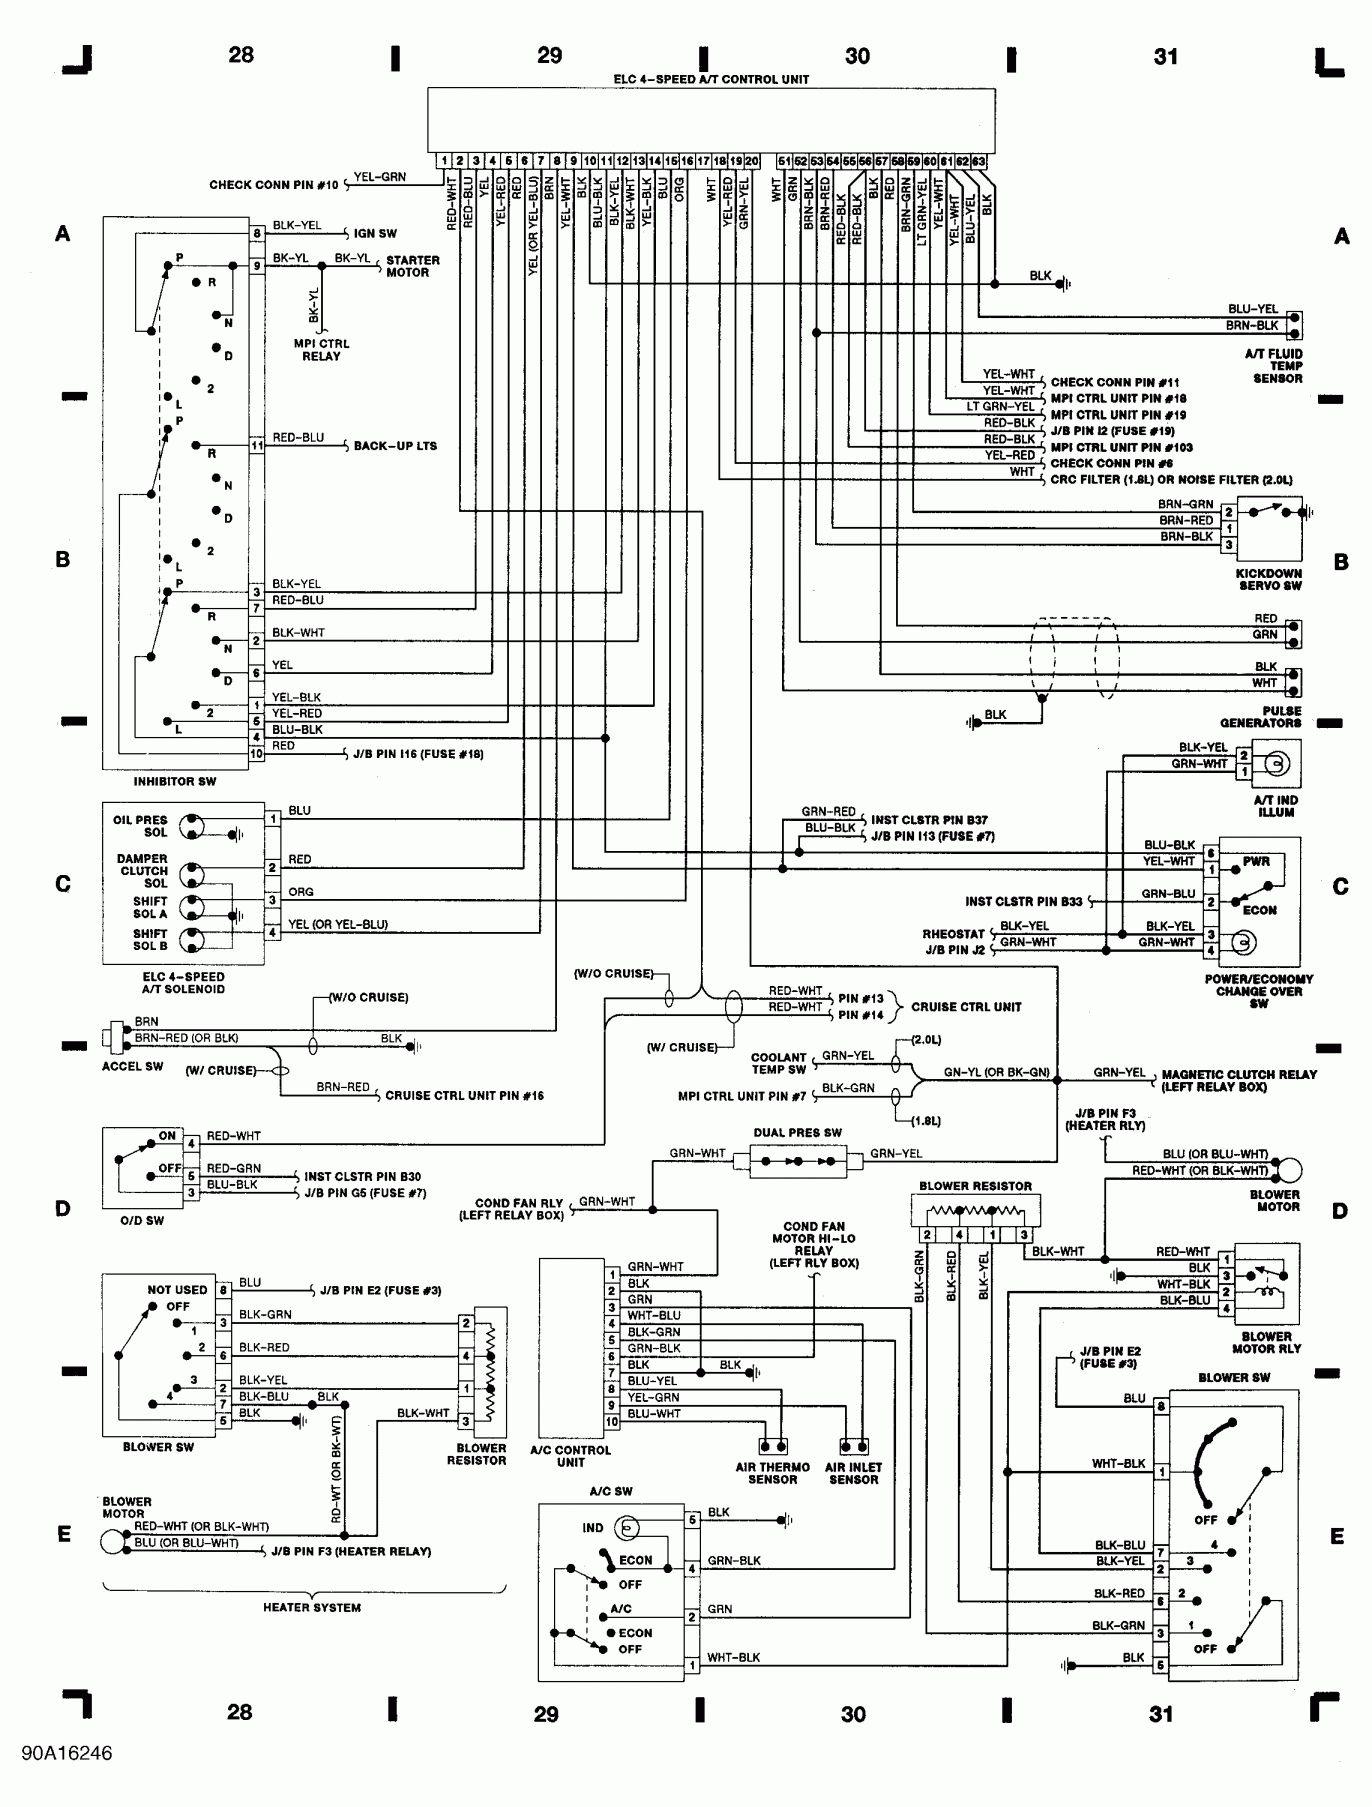 12 4g63 Engine Wiring Diagram Engine Diagram Wiringg Net Wiring Diagram Automatic Transmission Diagram